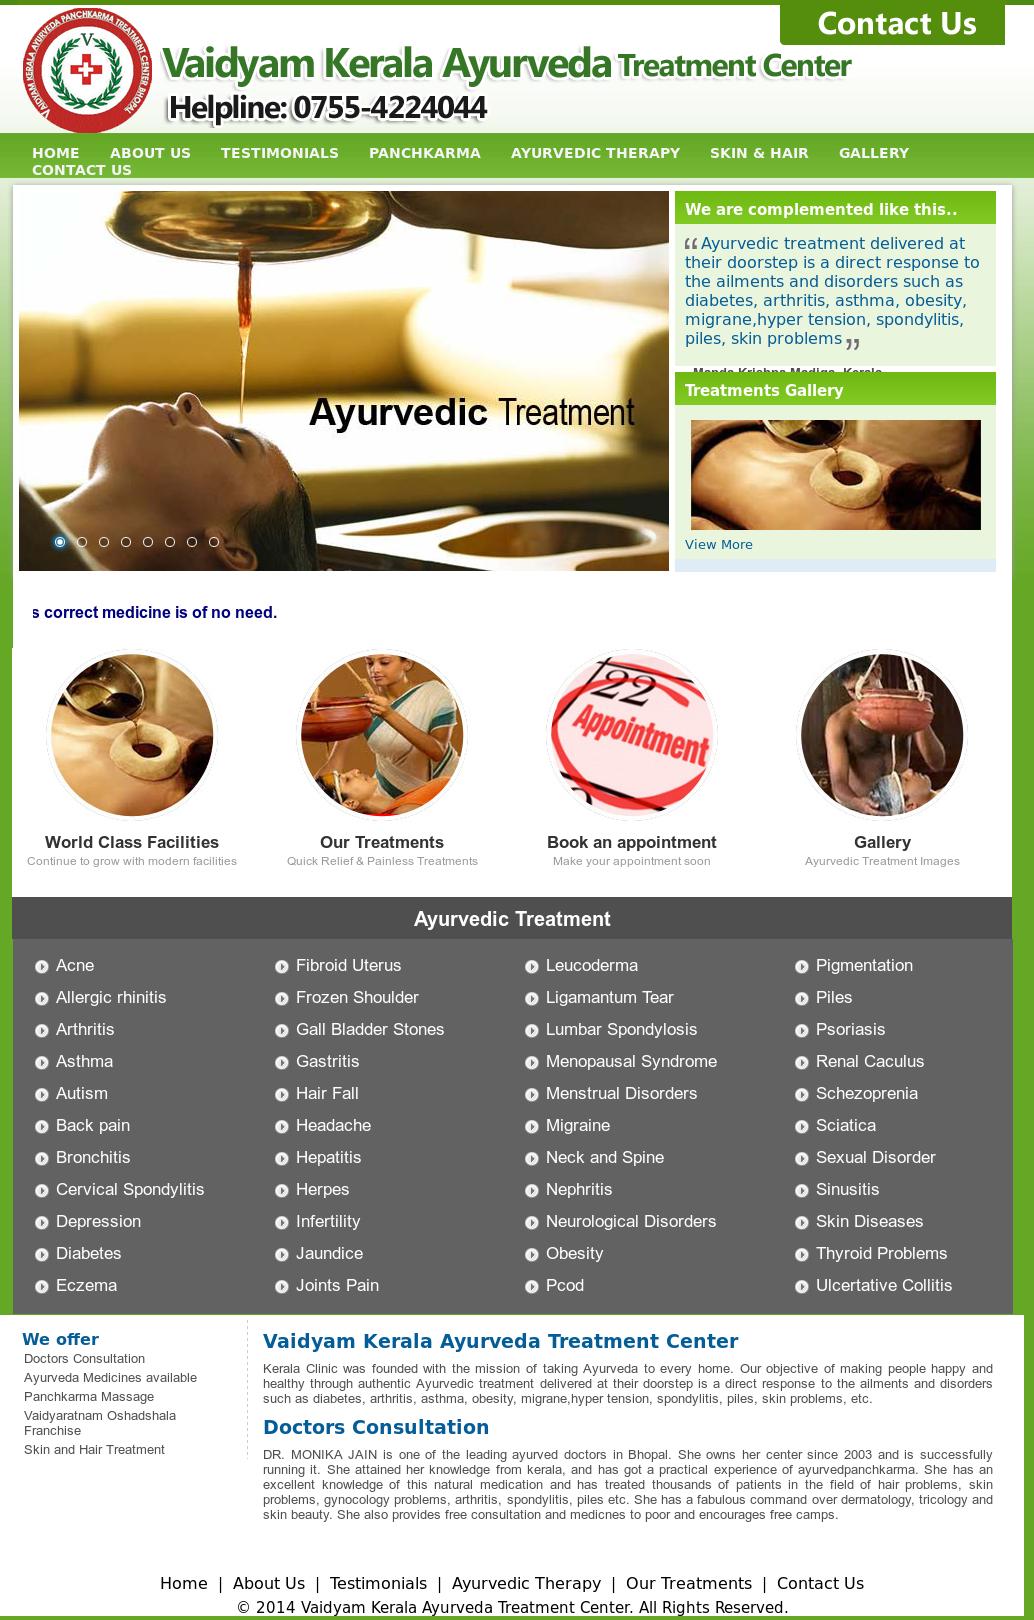 Vaidyam Kerala Ayurveda Treatment Center Competitors